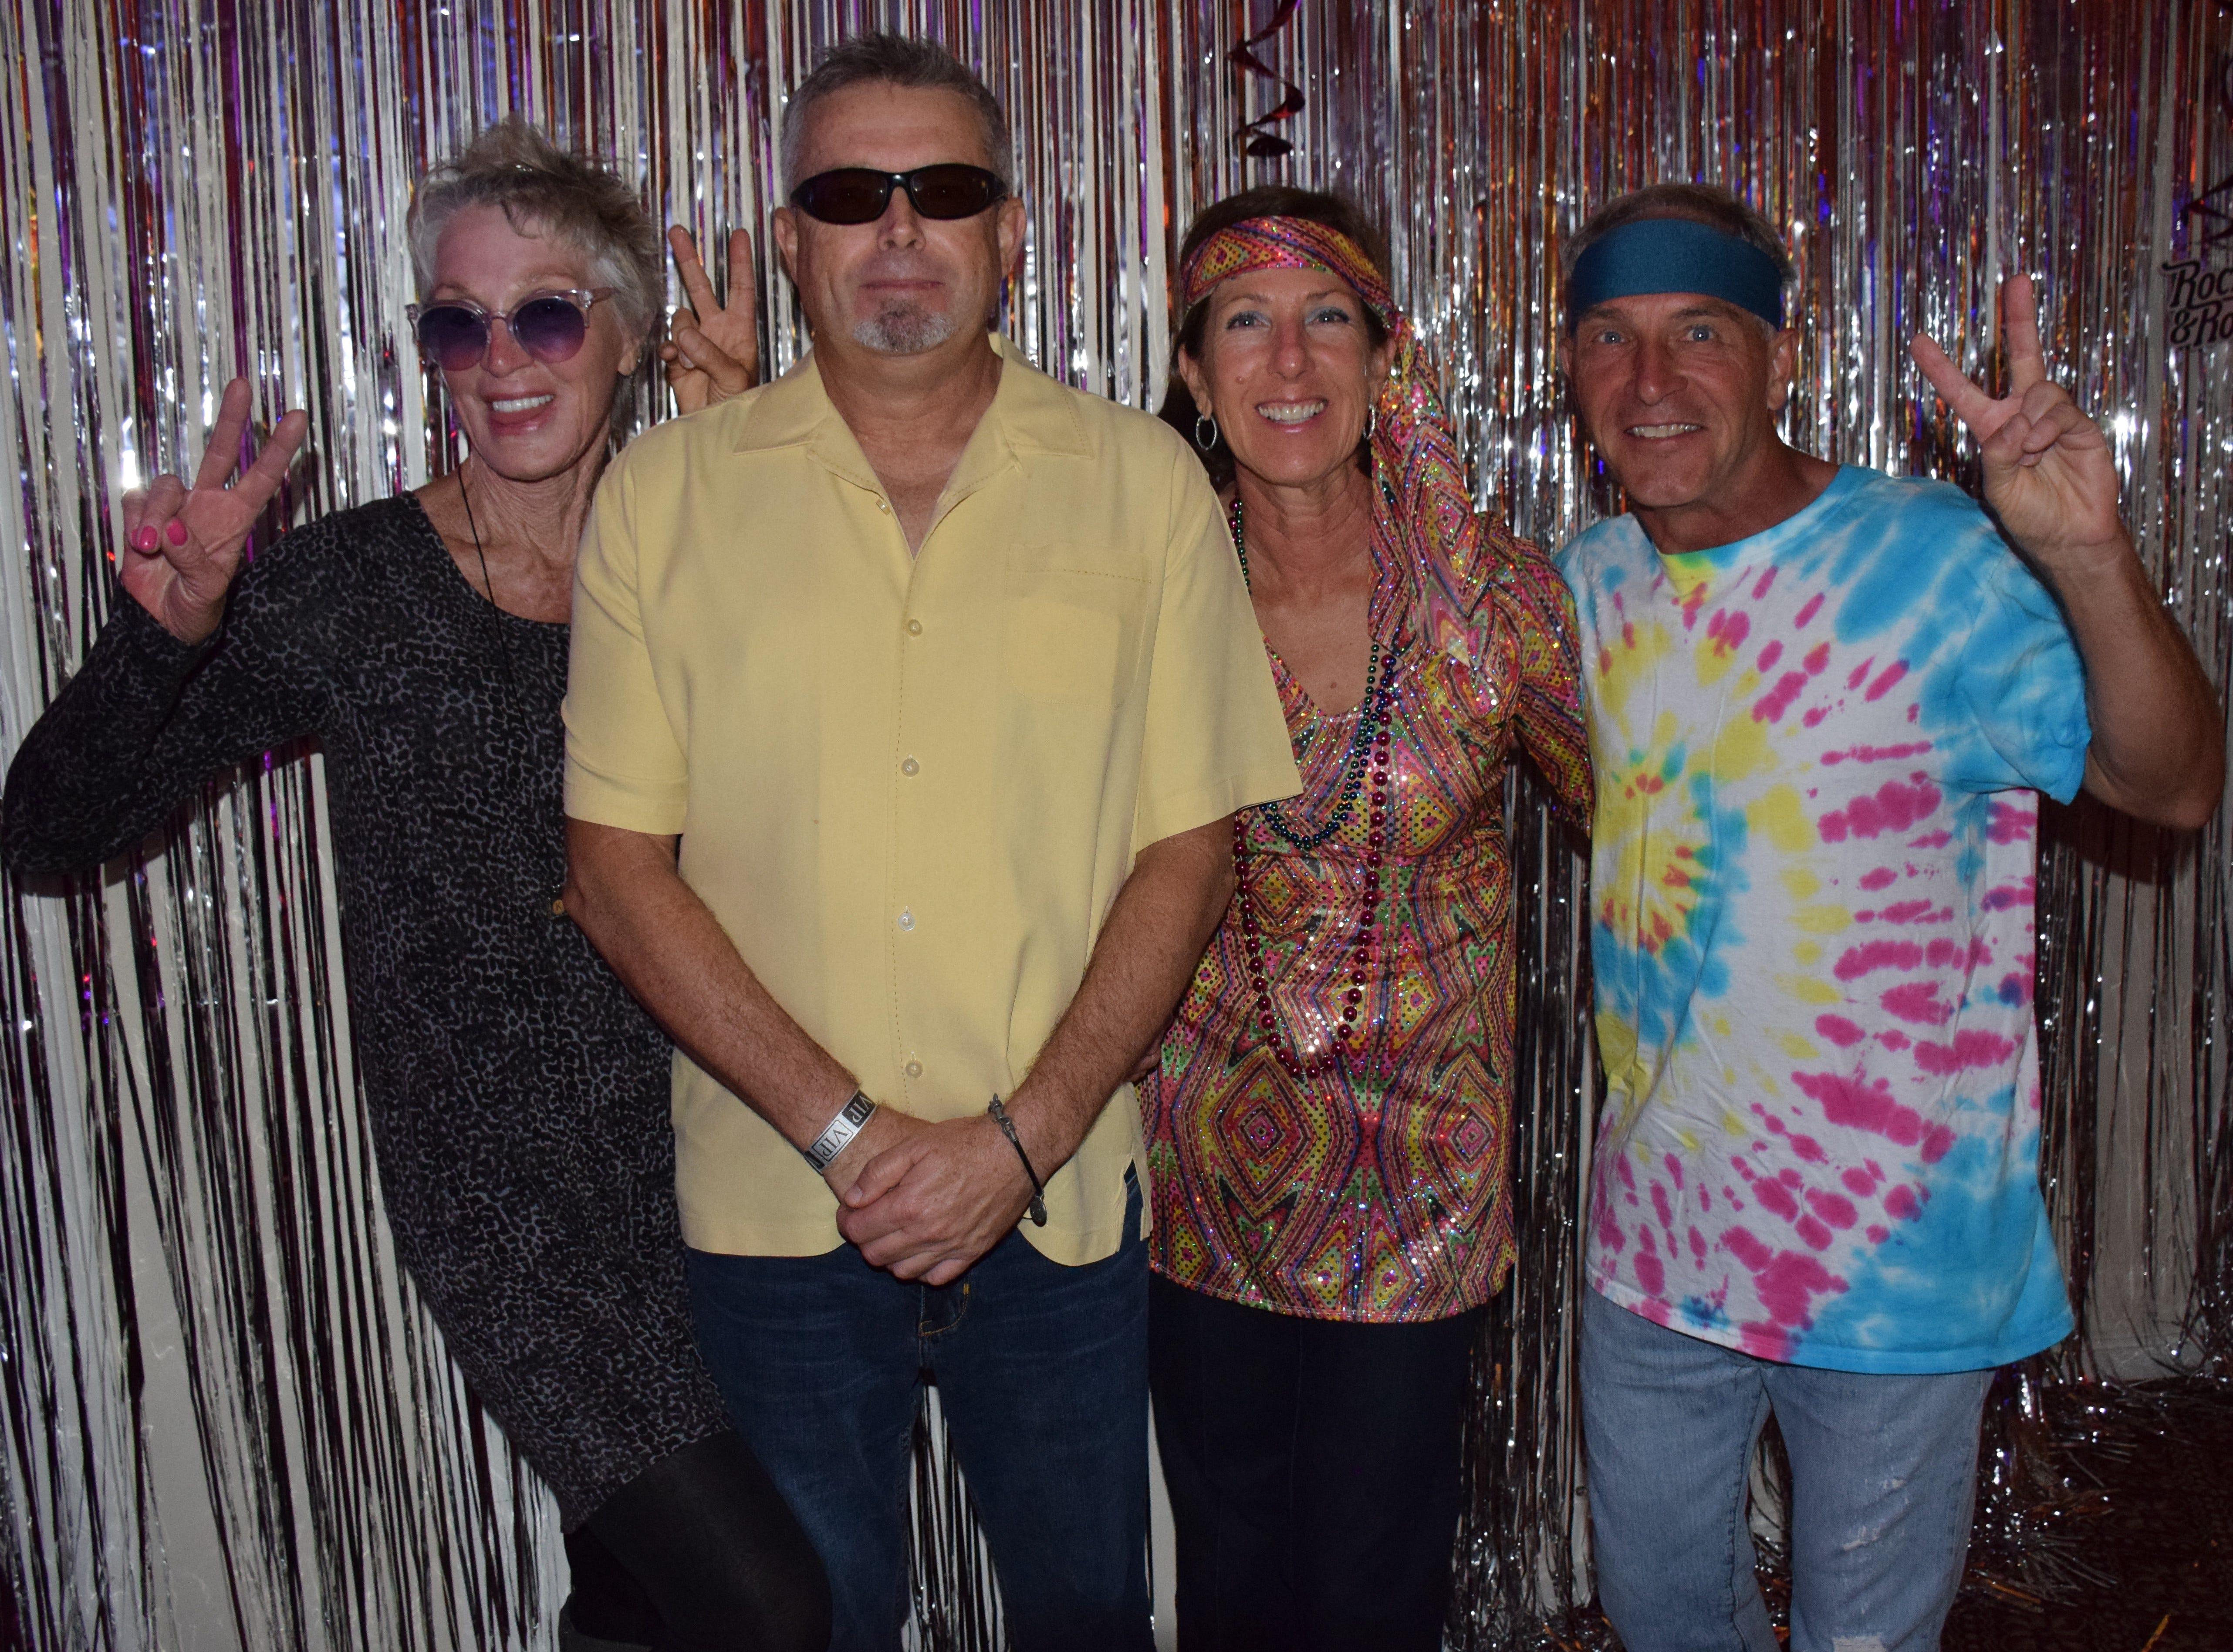 Karen Black, John Thompson and Libby & Jeff Hazard